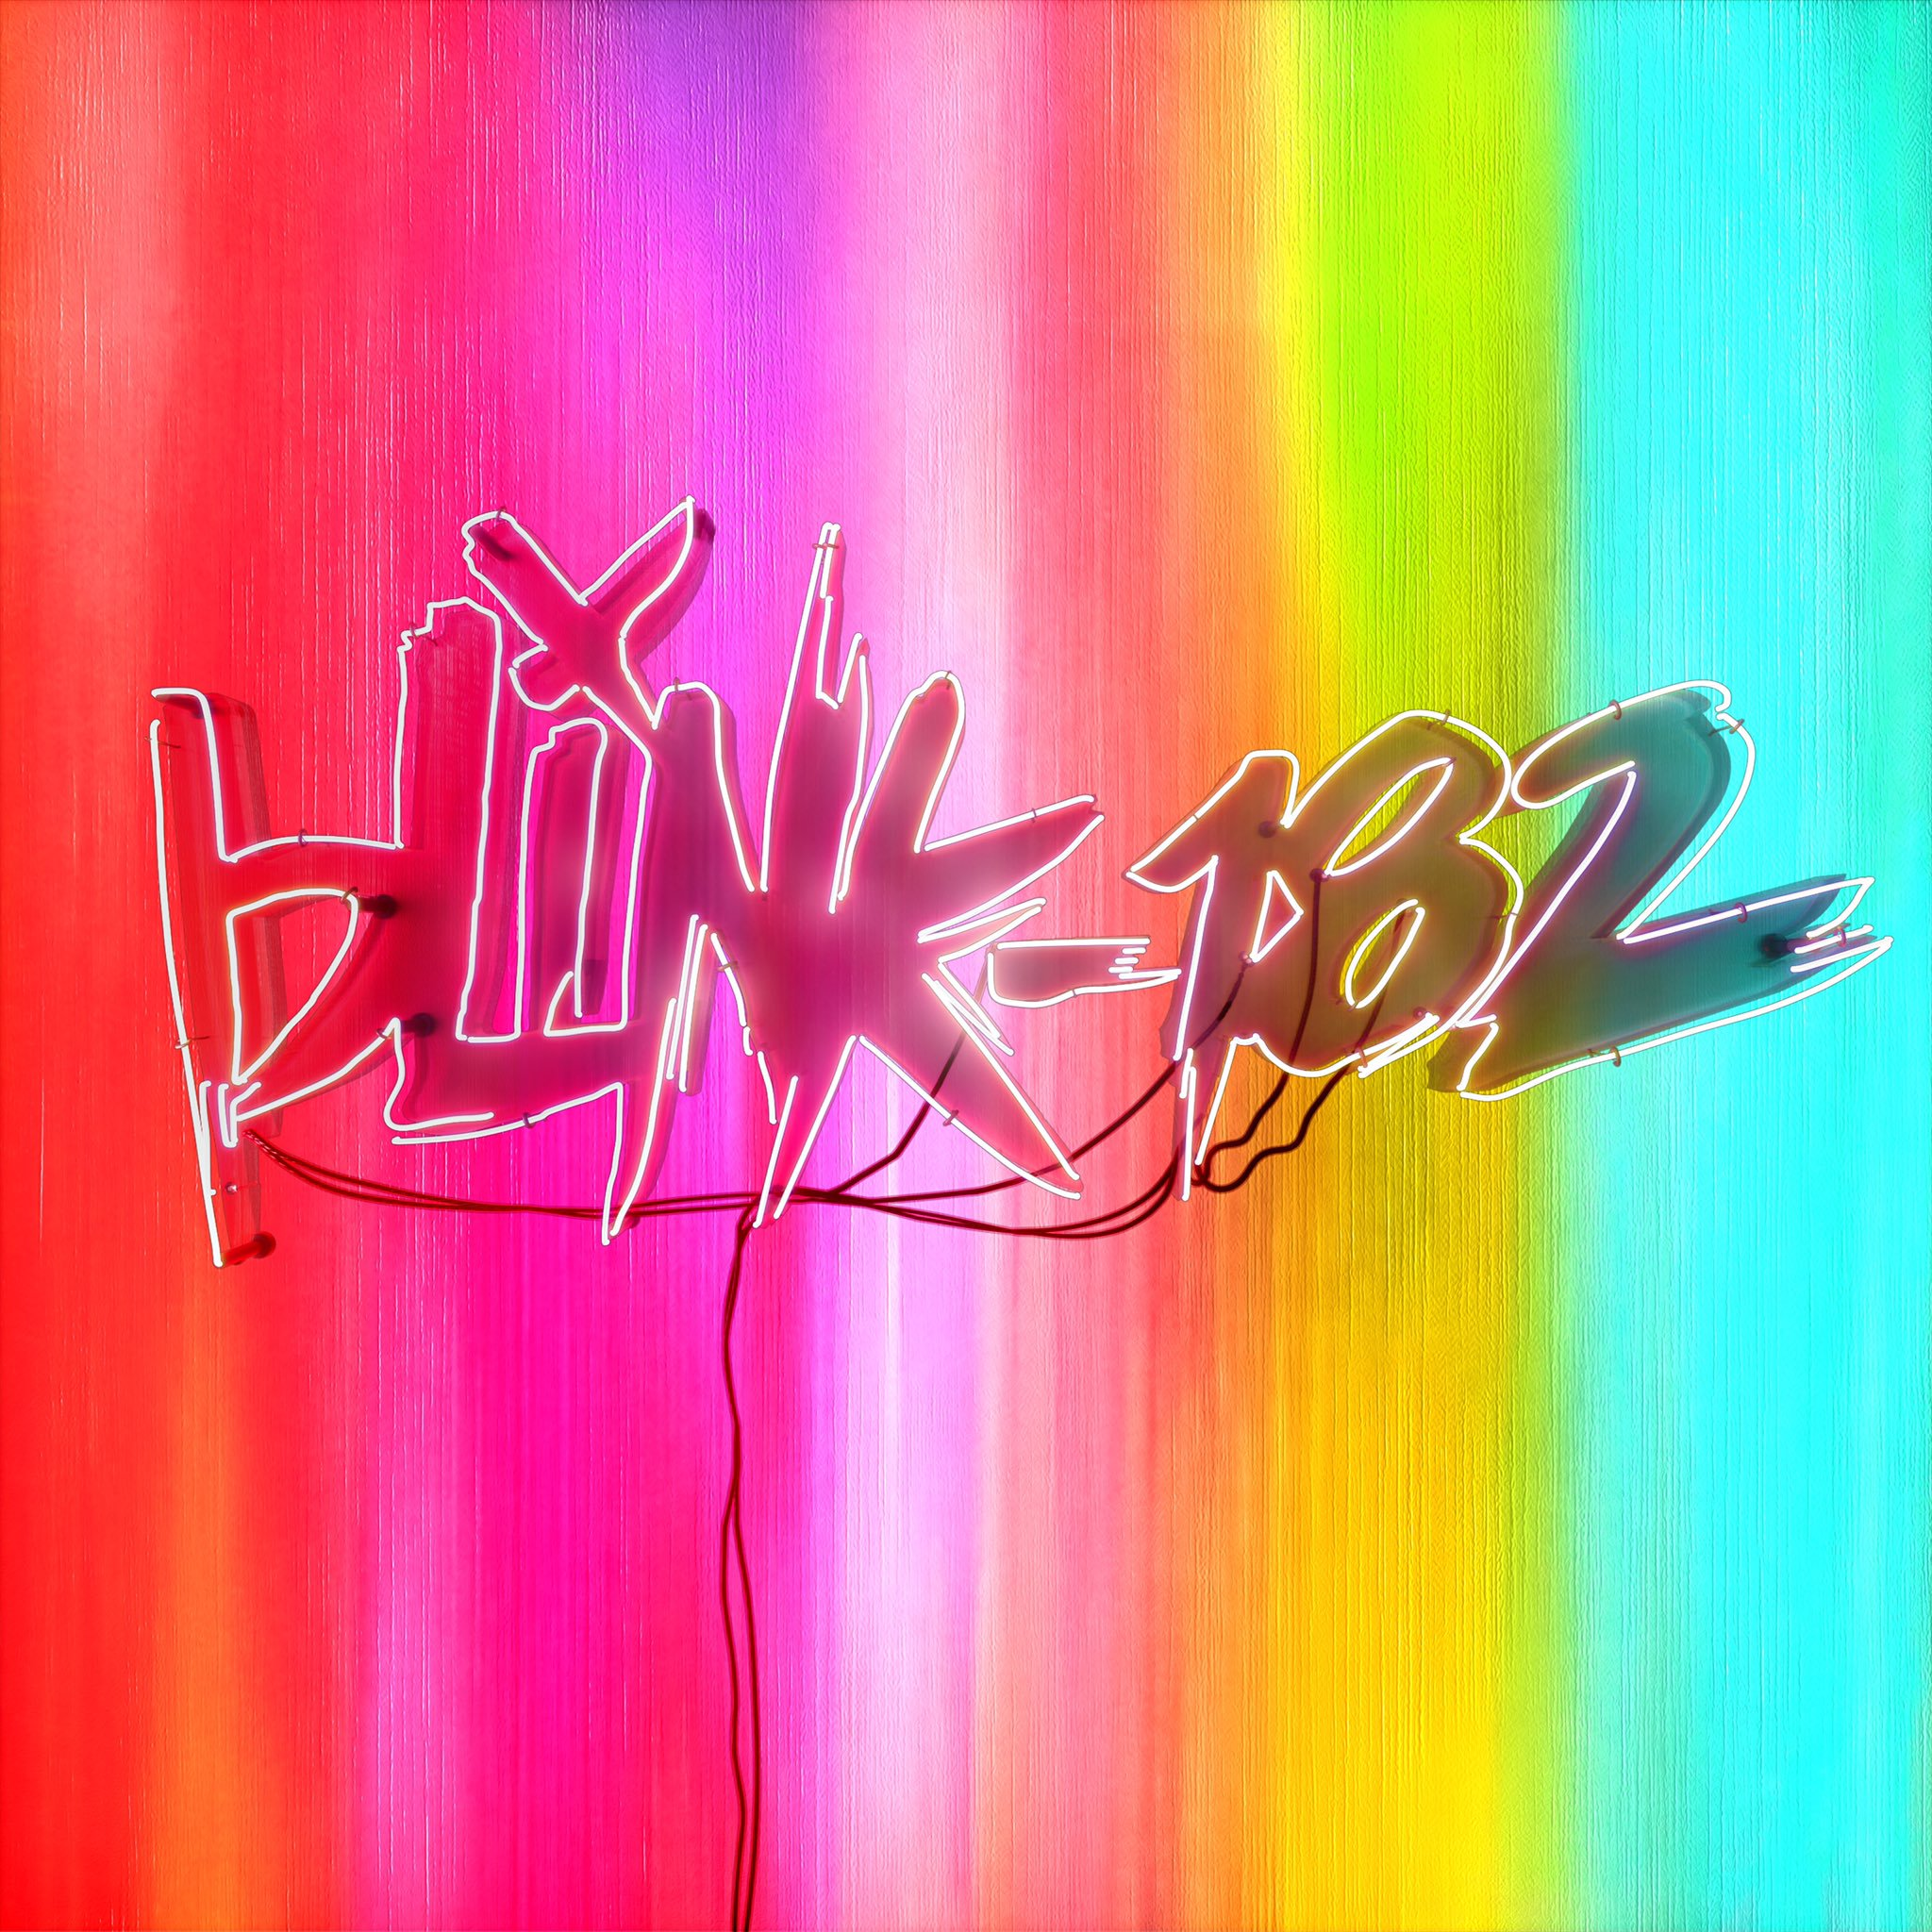 blink-182 nine artwork album front